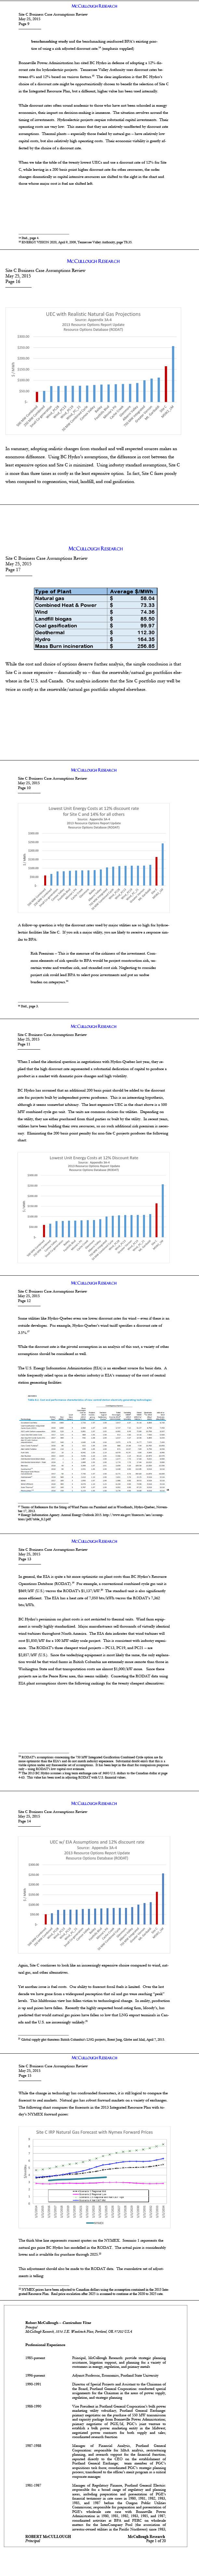 Site-C-Economic-Evaluation-16-RM-B.jpg